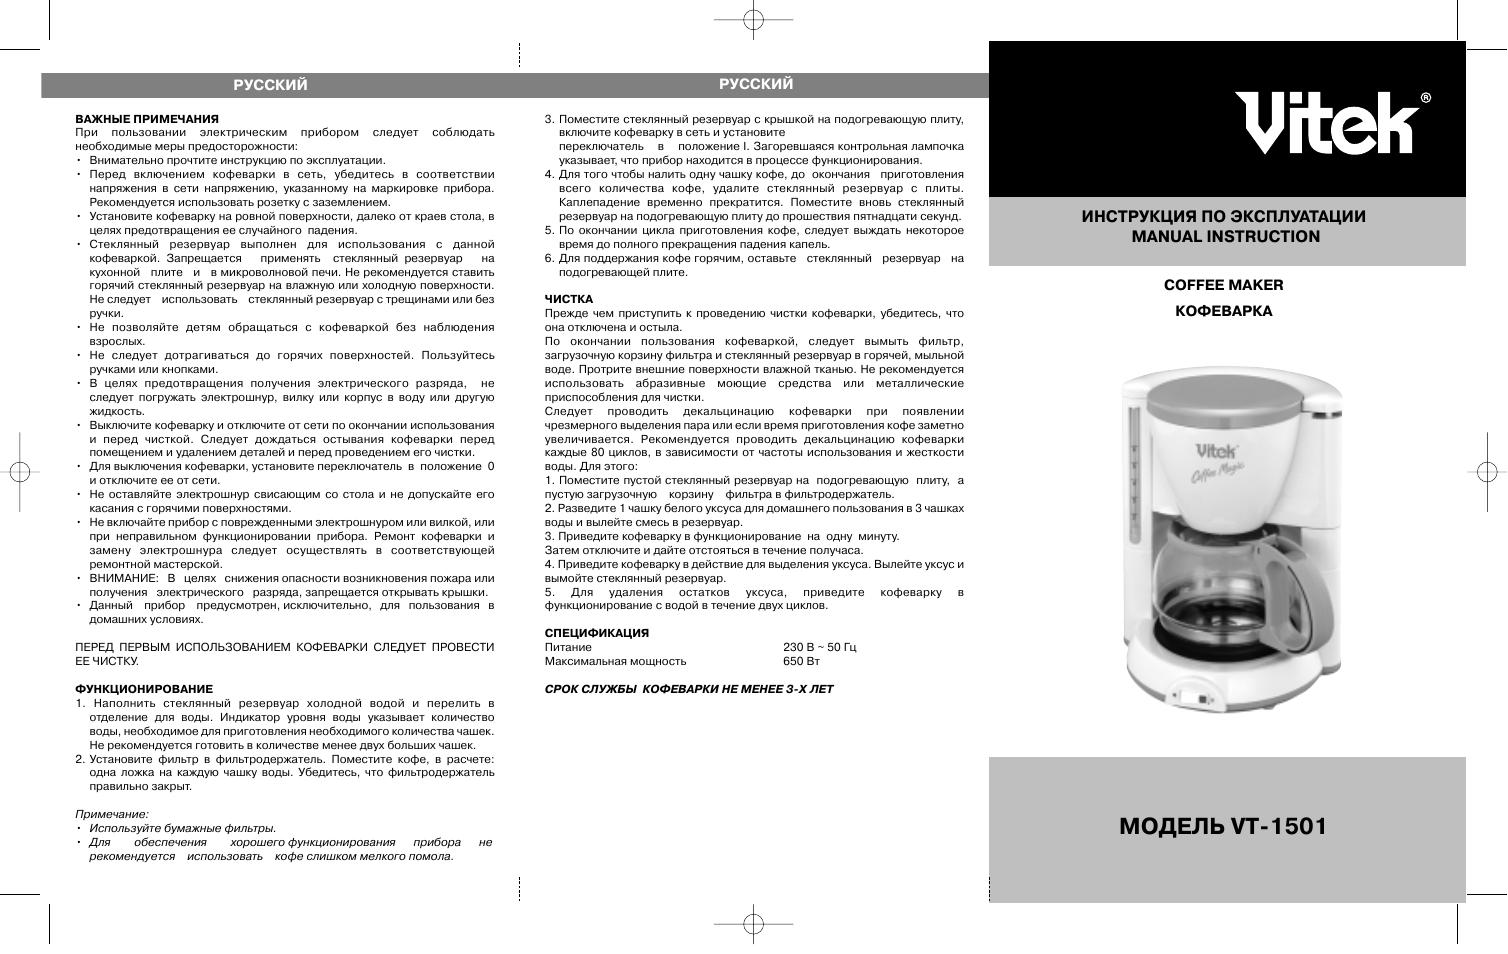 инструкция на кофеварку камерон 6850